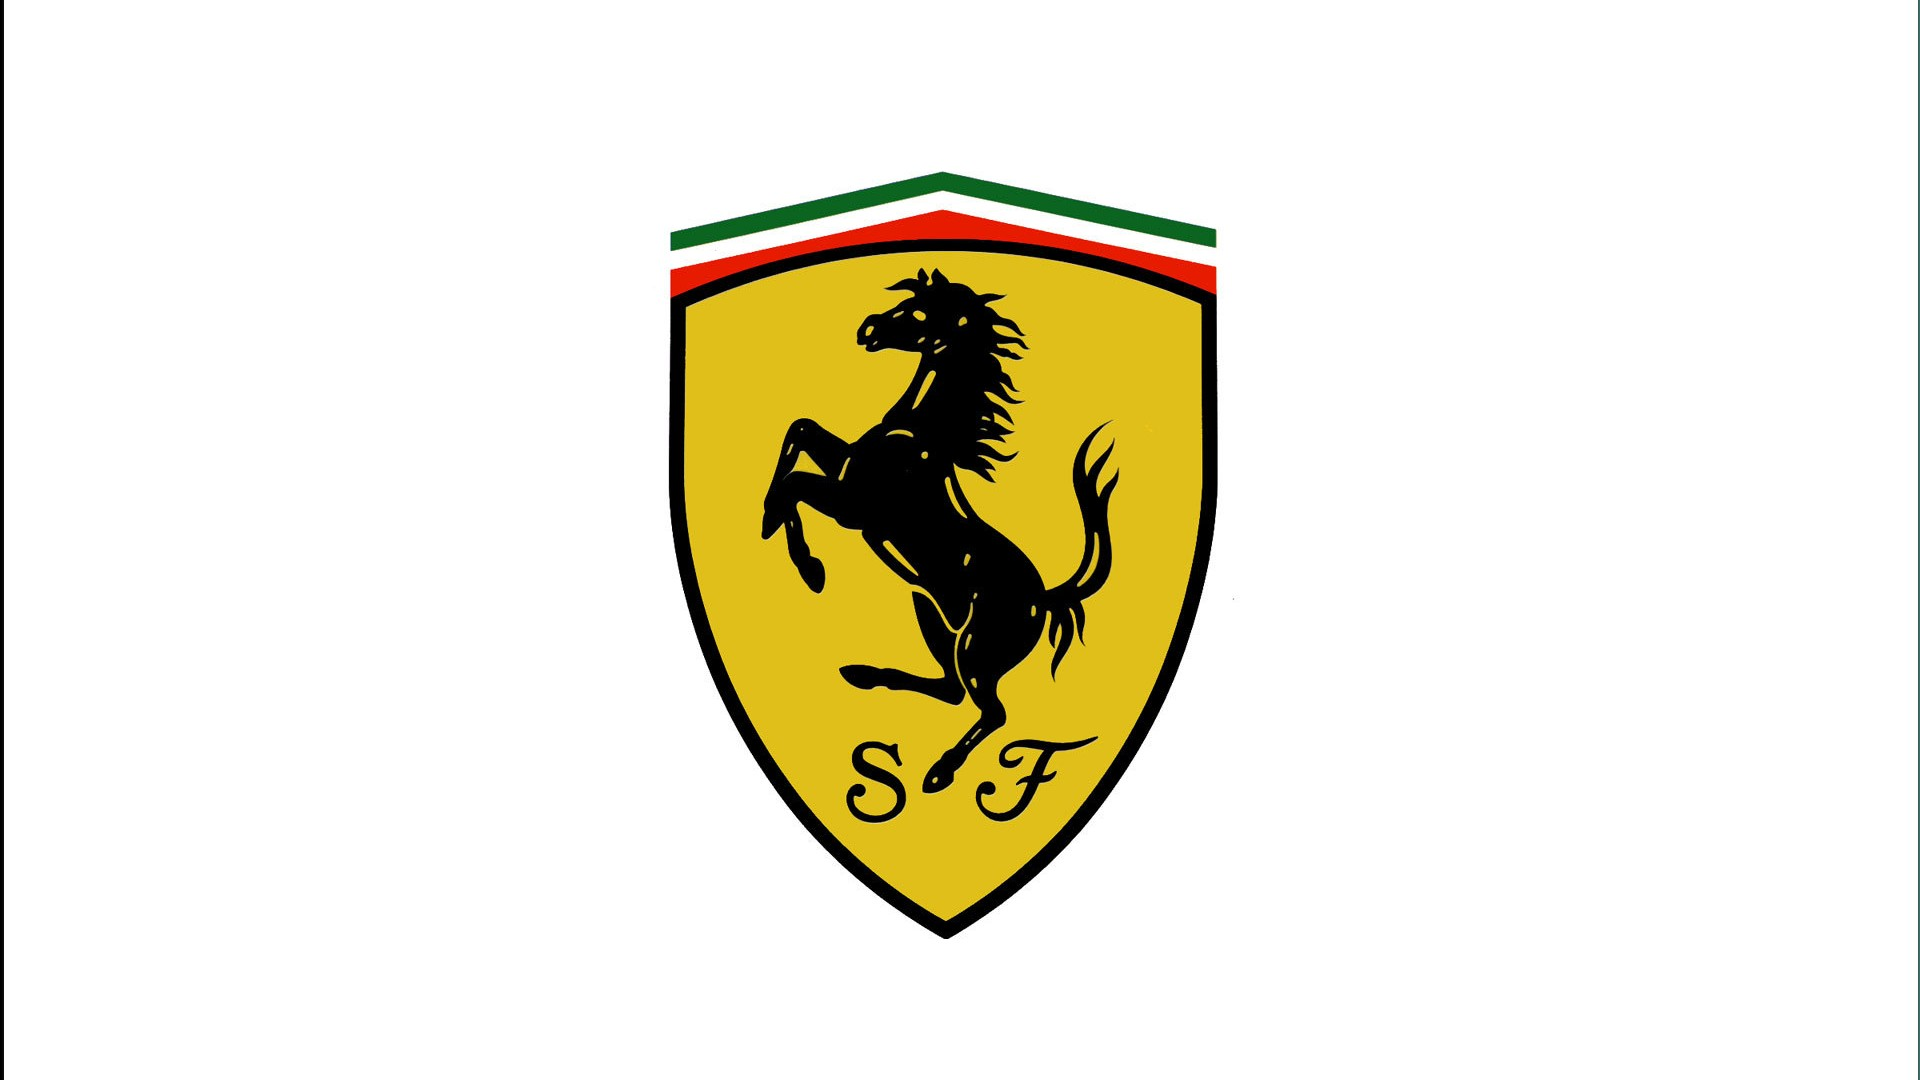 Scuderia Ferrari Logo White Background 1920x1080 Download Hd Wallpaper Wallpapertip